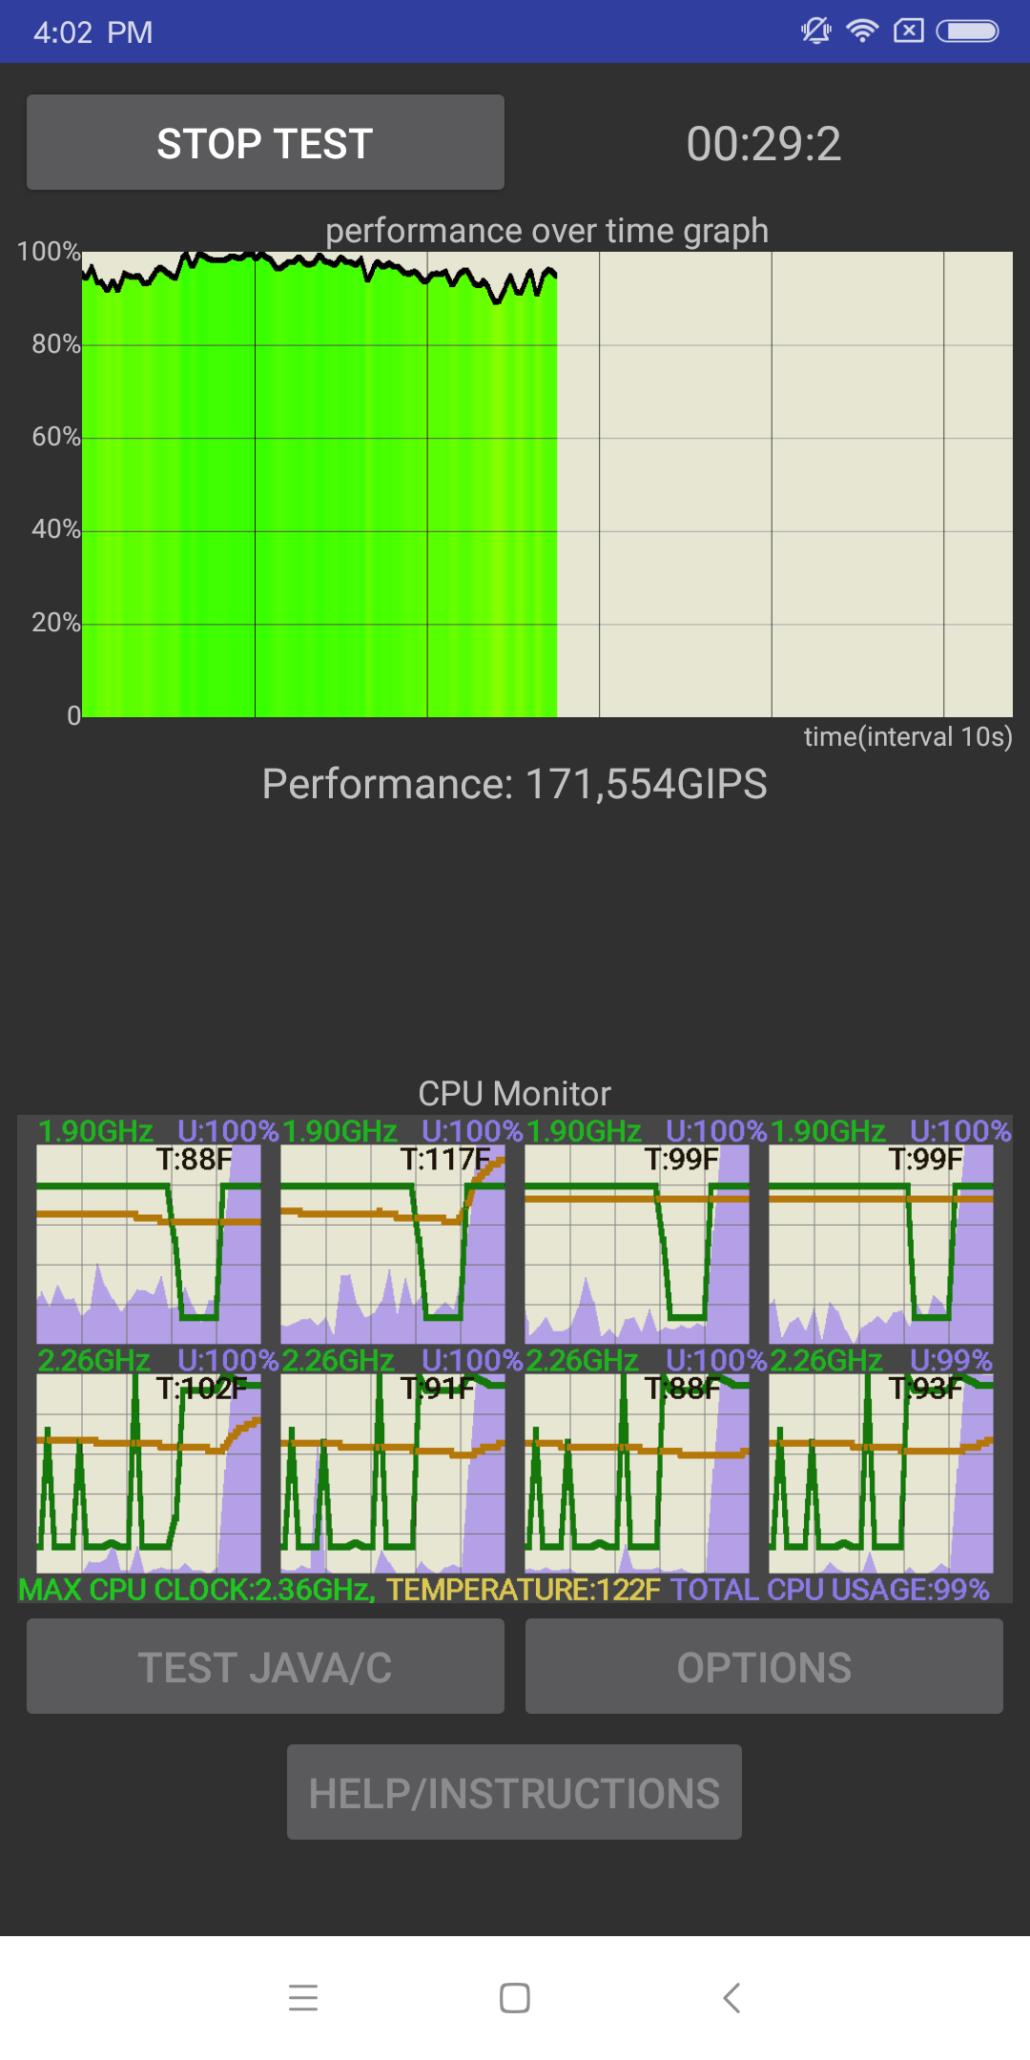 screenshot_2018-01-29-16-02-26-032_skynet-cputhrottlingtest